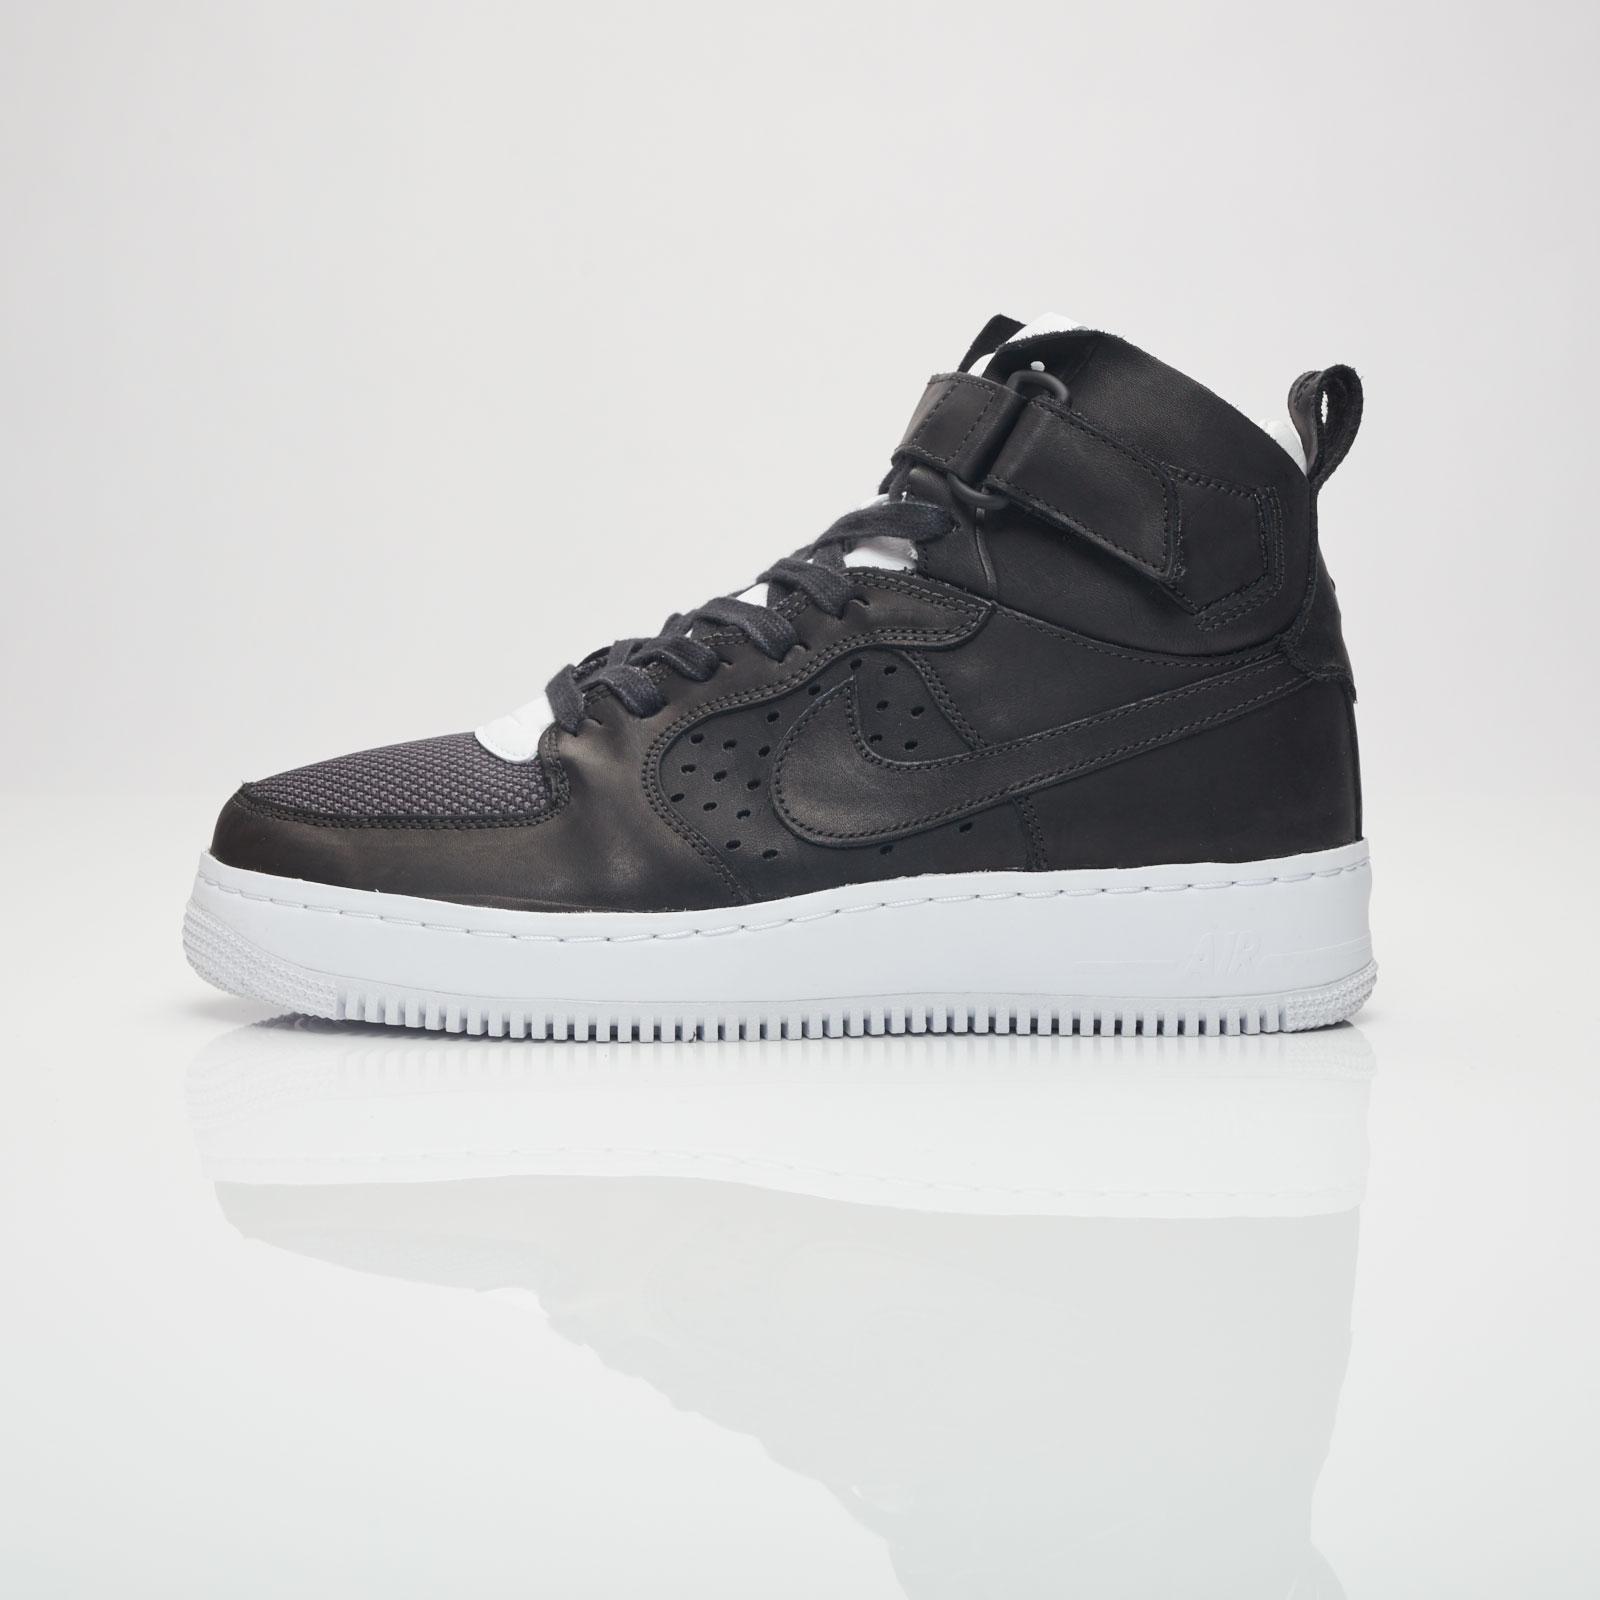 1c944cf47 Nike Air Force 1 Hi Cmft Tc Sp - 917494-001 - Sneakersnstuff ...